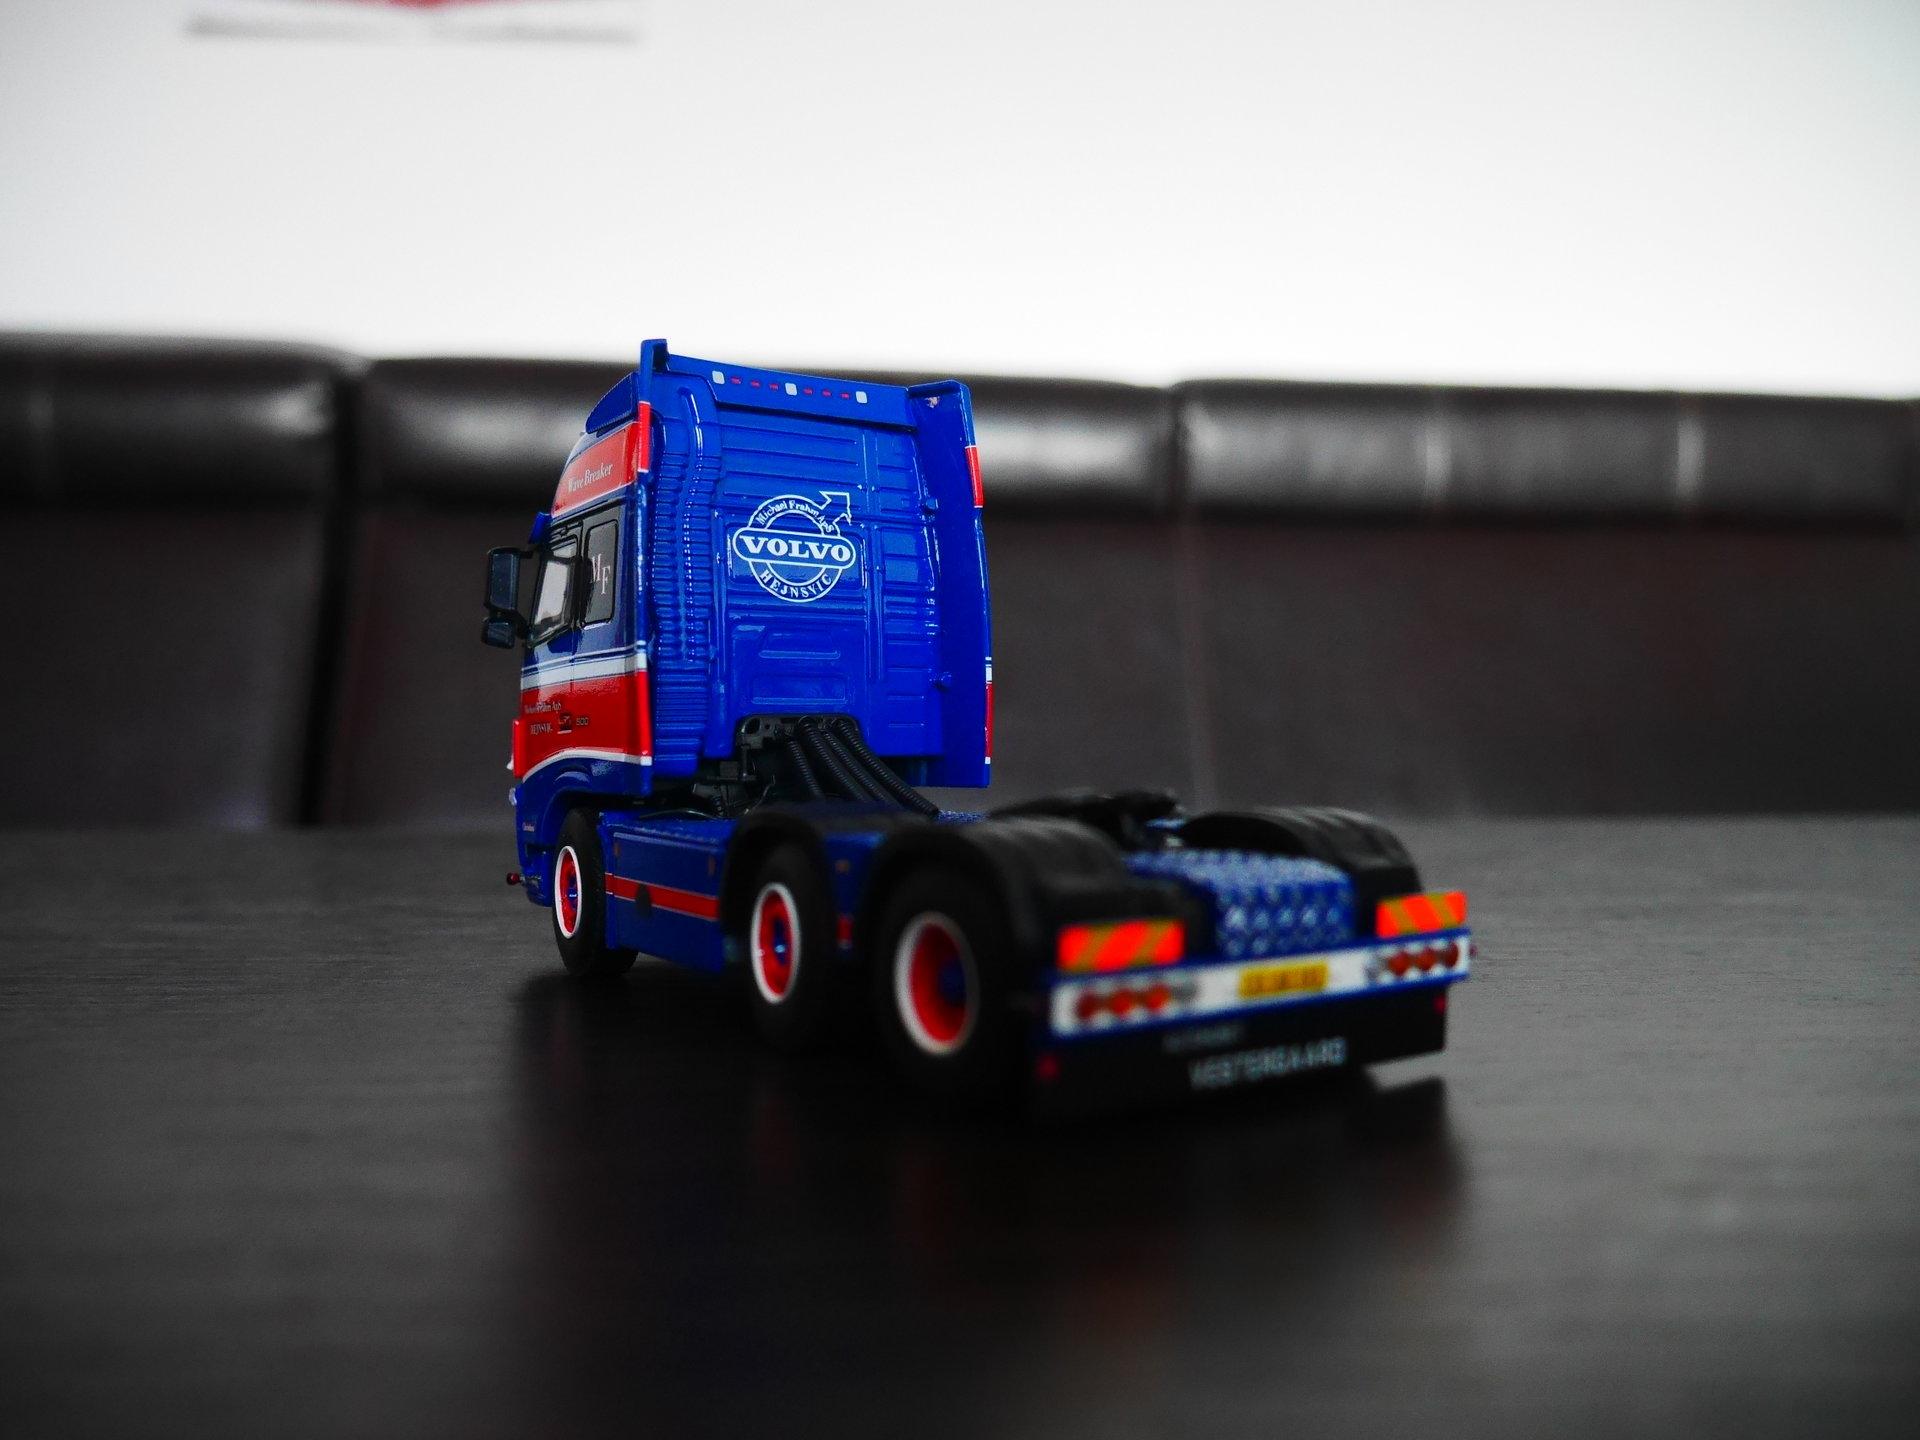 P1060779.JPG